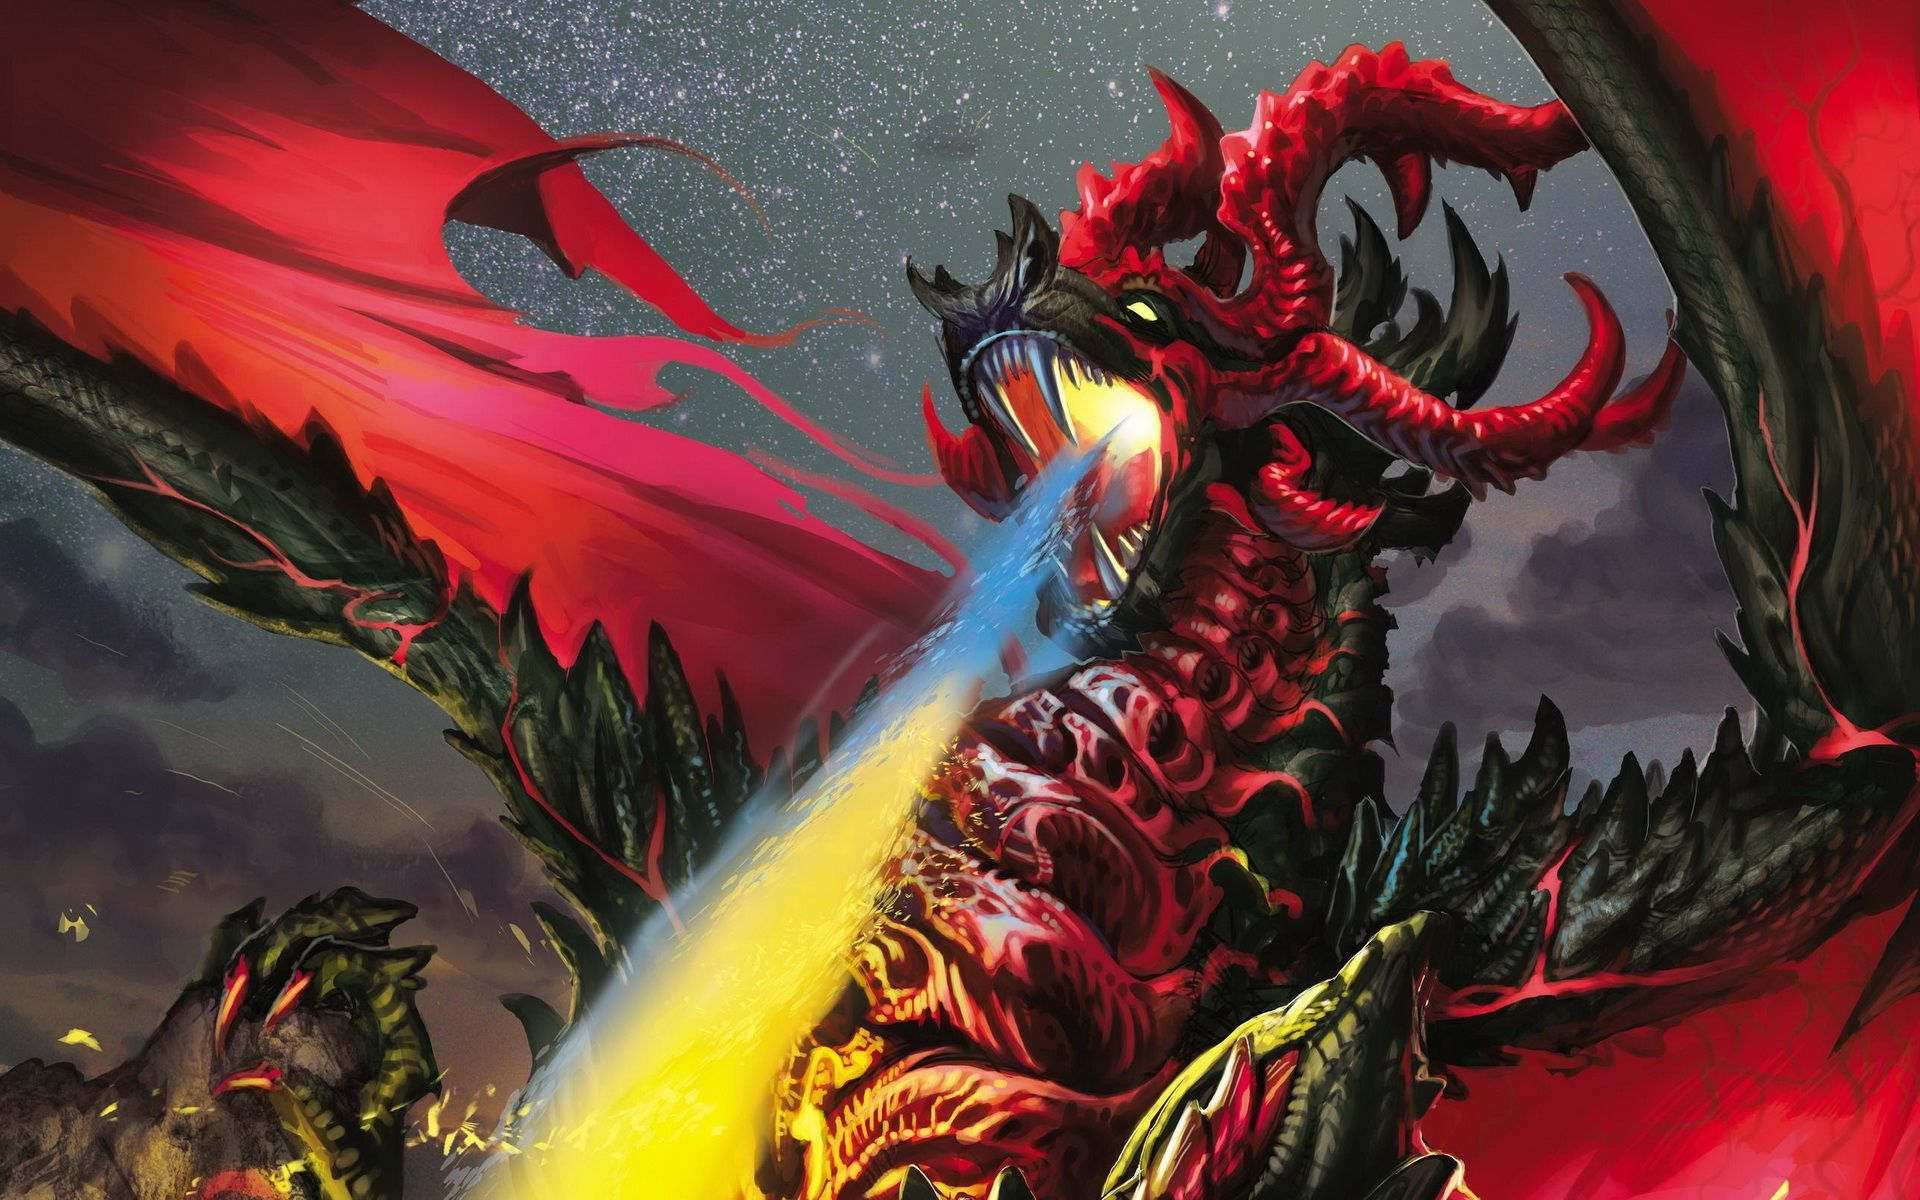 Dragon Fire Wallpapers HD 8 1920x1200